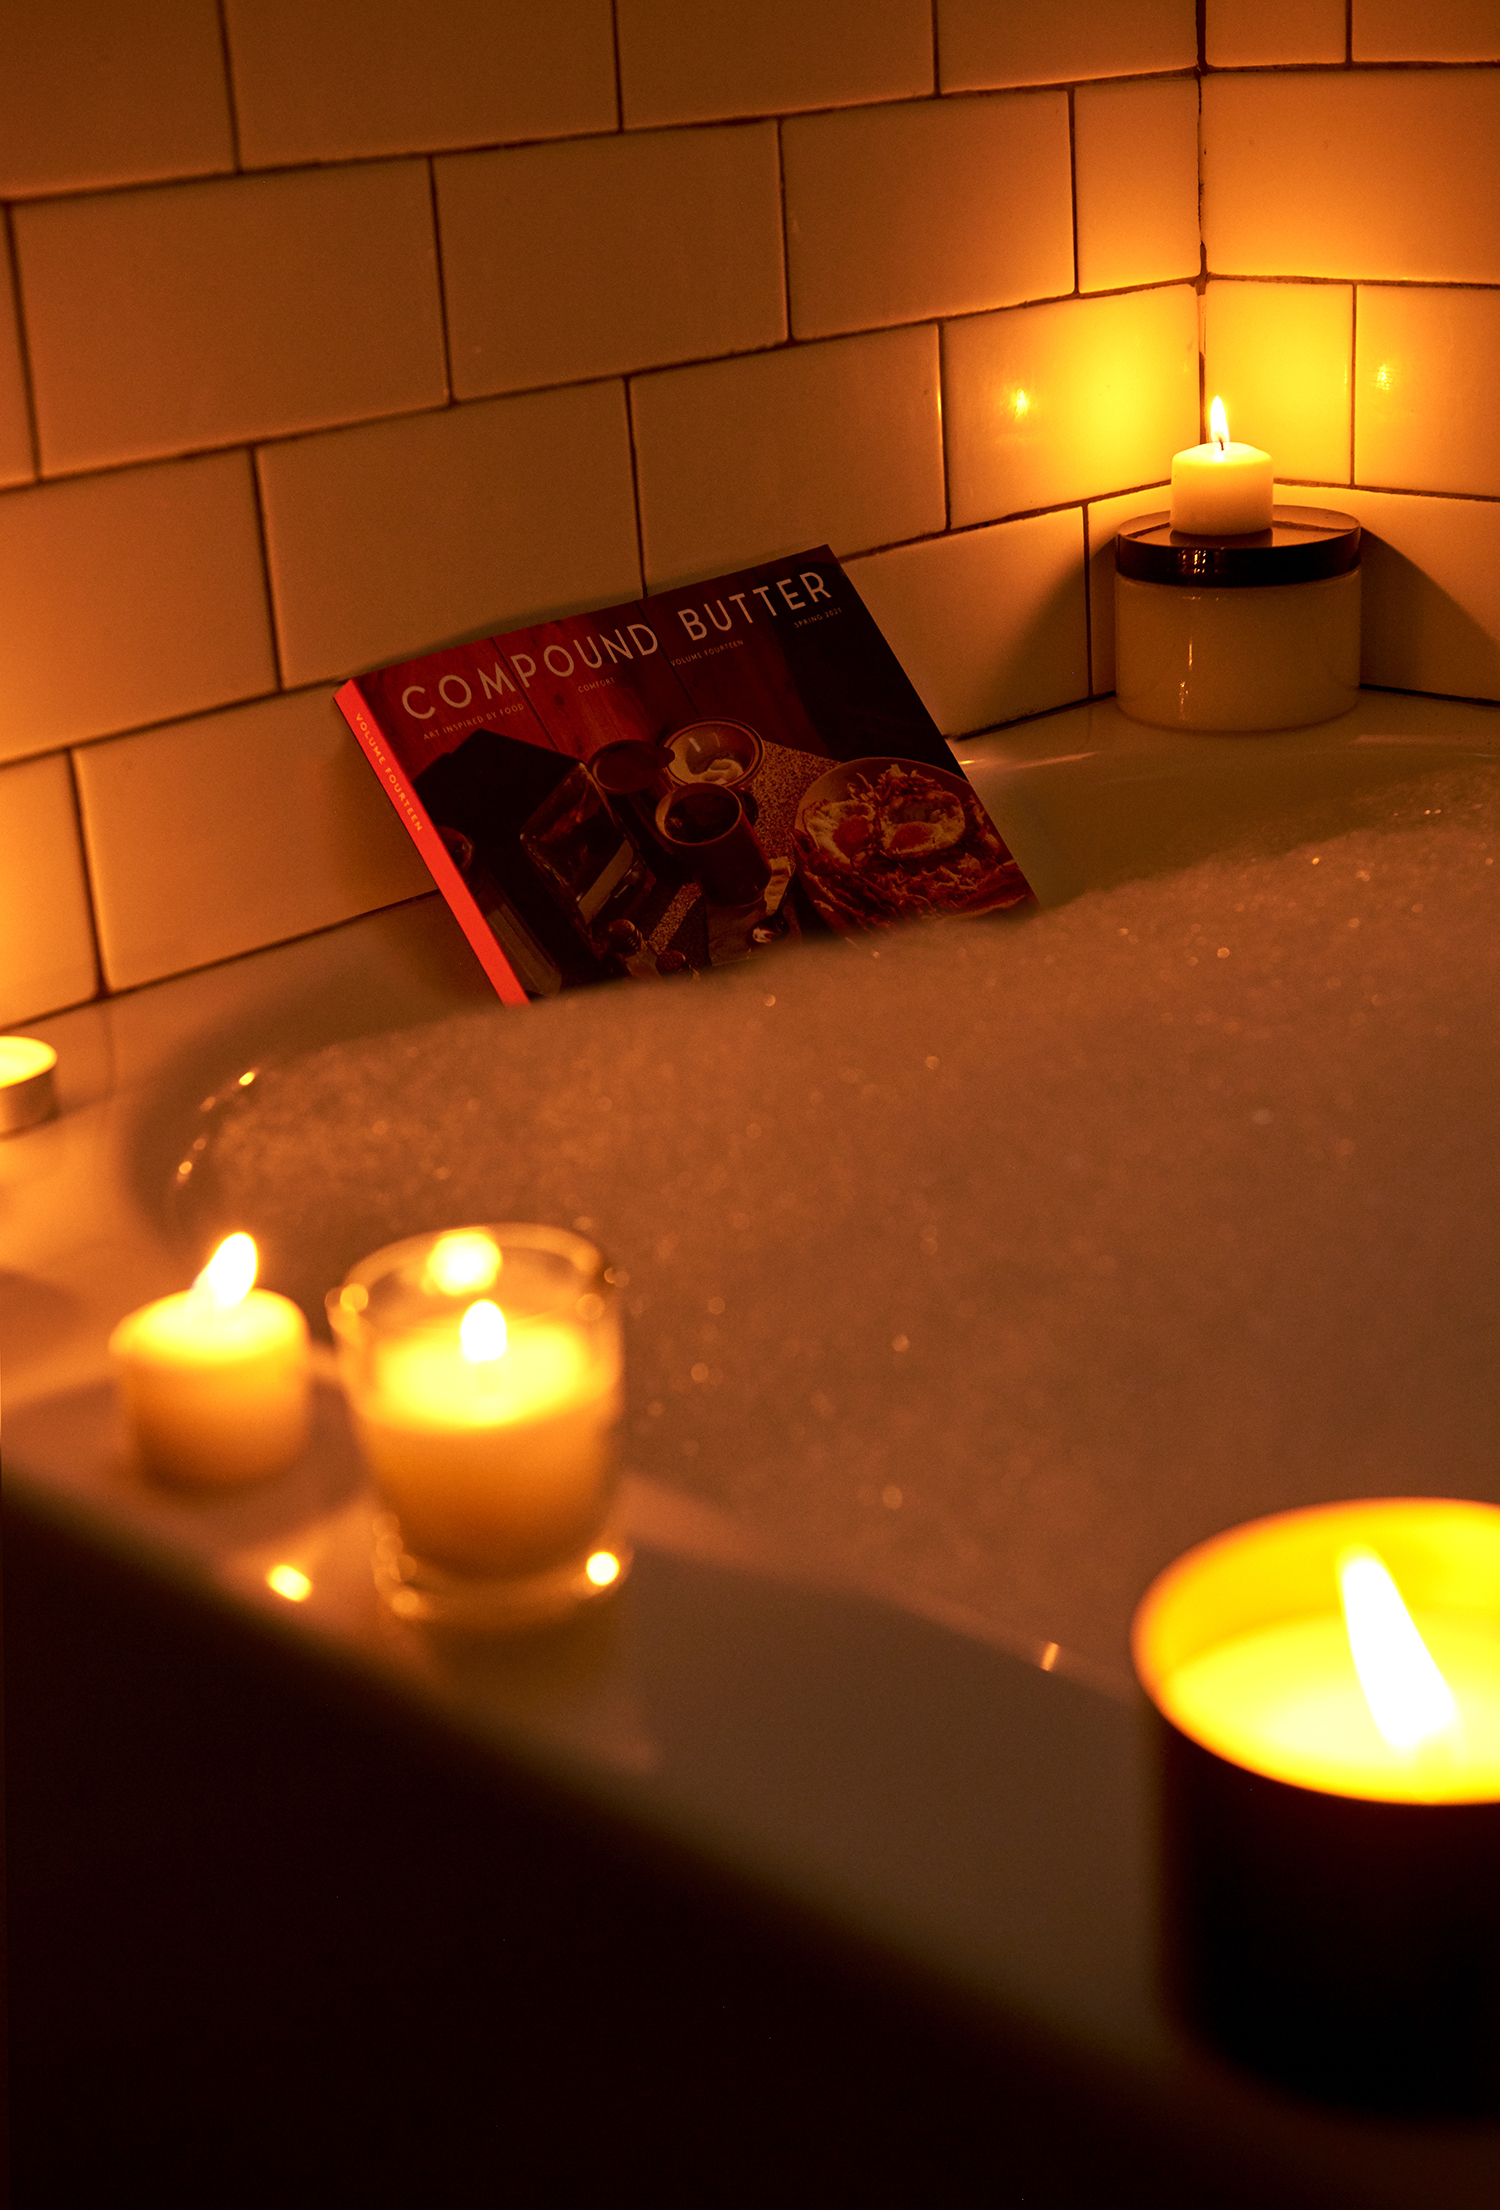 Compound Butter – Comfort Issue – Candle Bath – Yasara Gunawardena